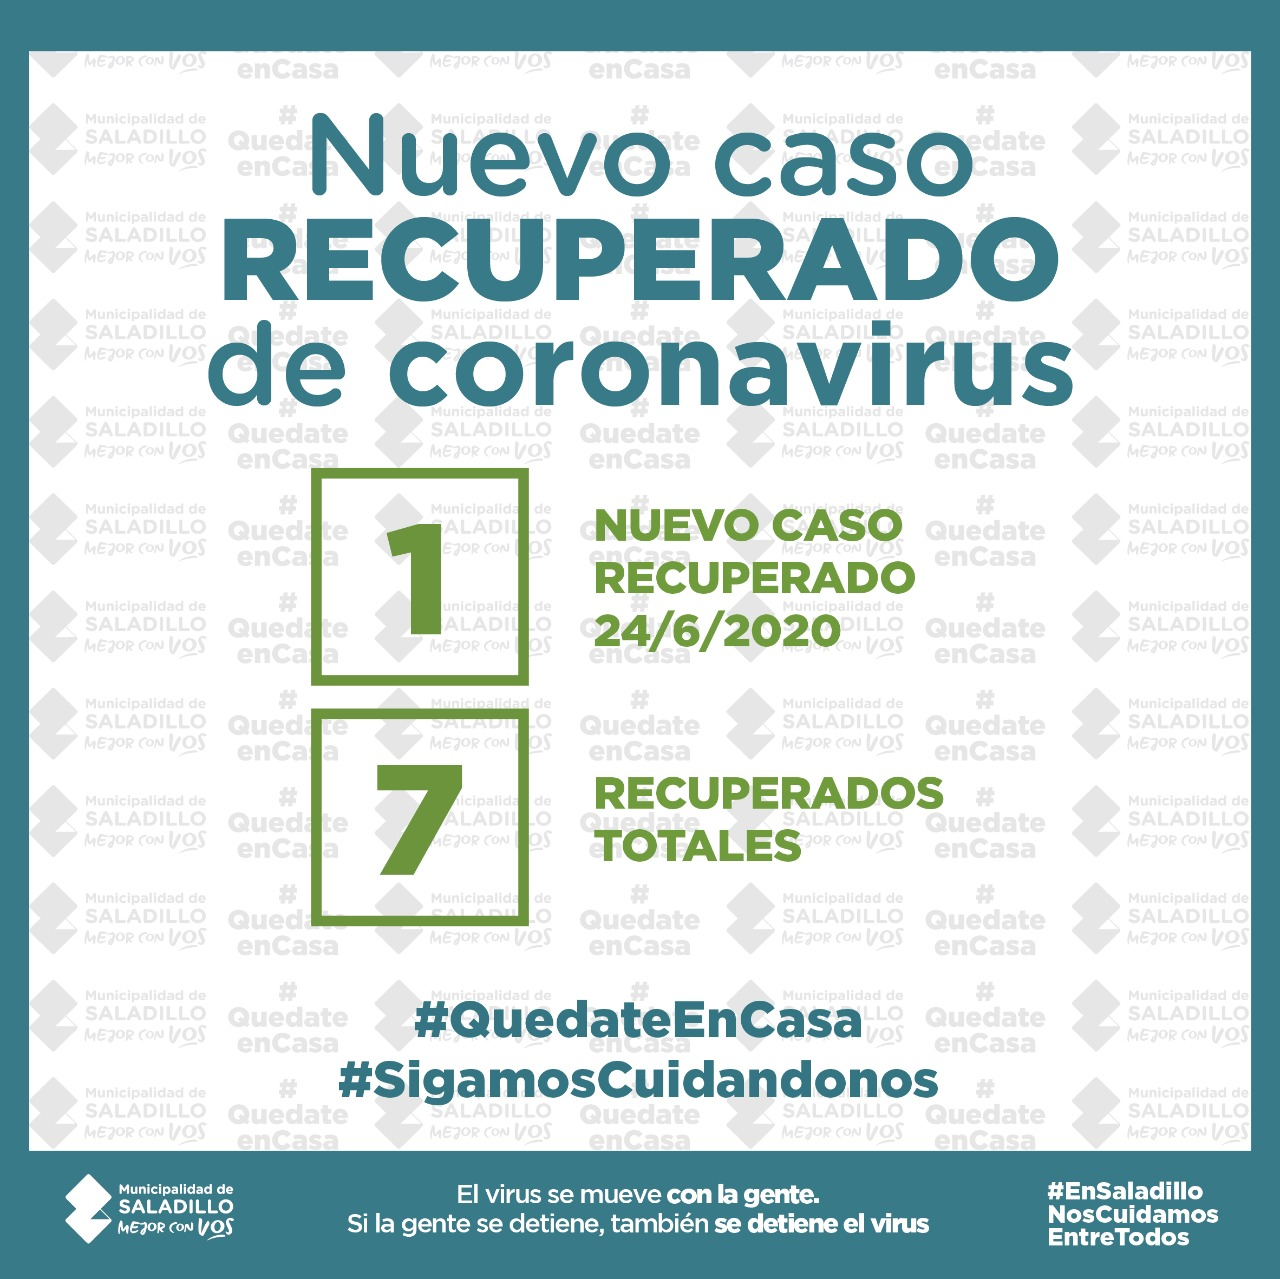 SALADILLO: NUEVO CASO RECUPERADO DE CORONAVIRUS